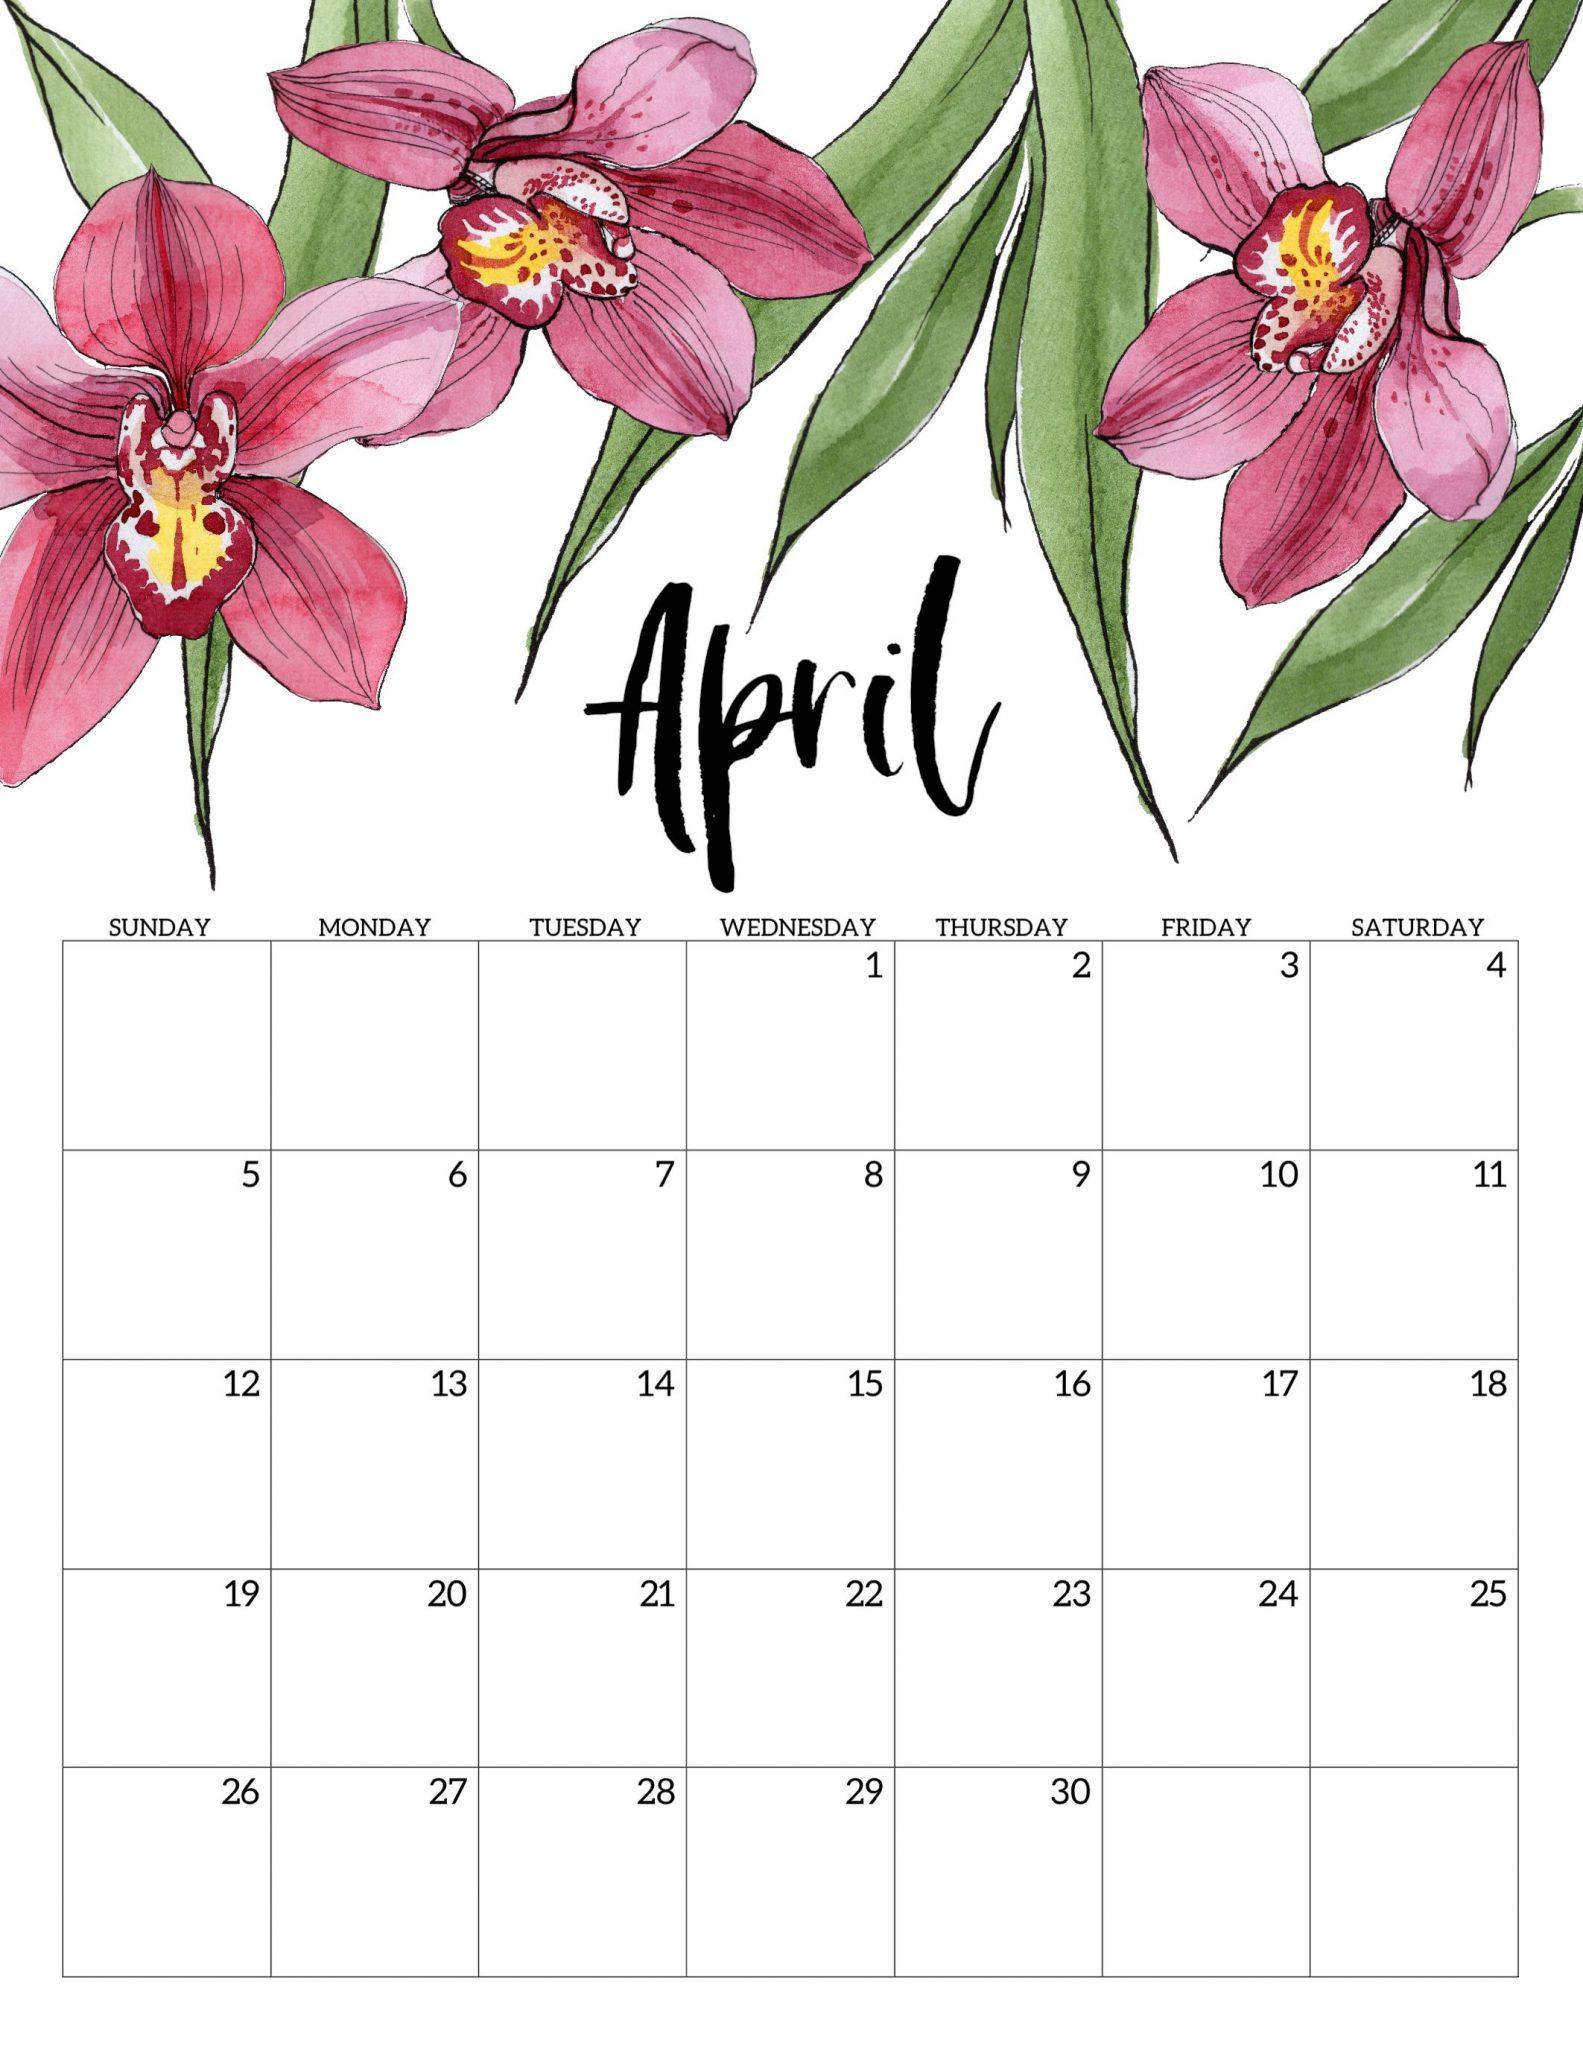 Cute April 2020 Floral Calendar